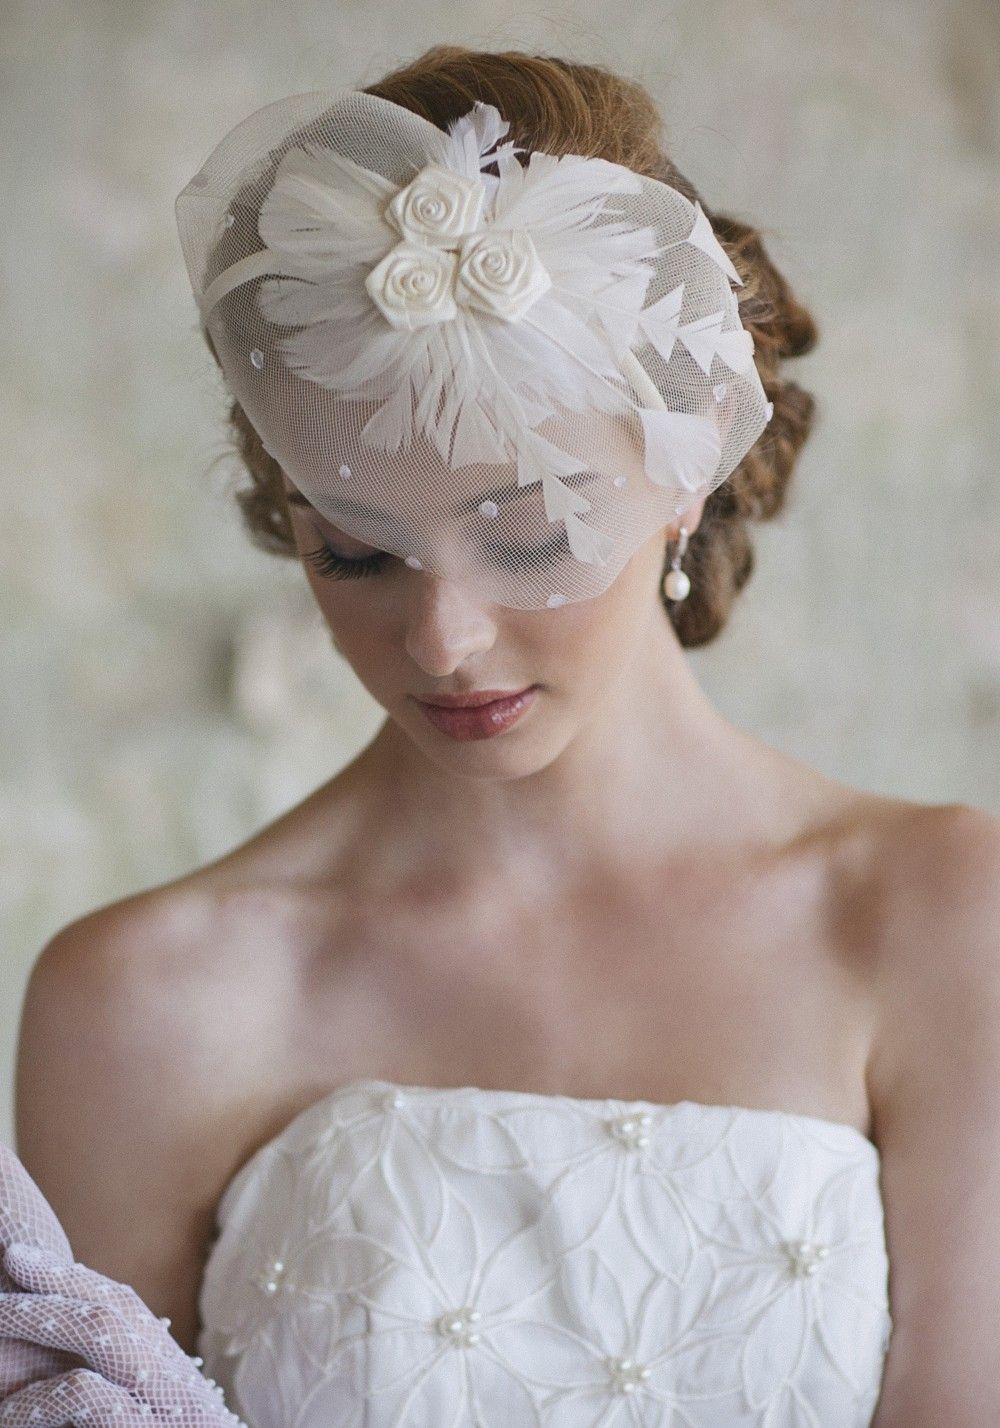 Vintage Wedding Hair Accessories Pinterest | Fade Haircut